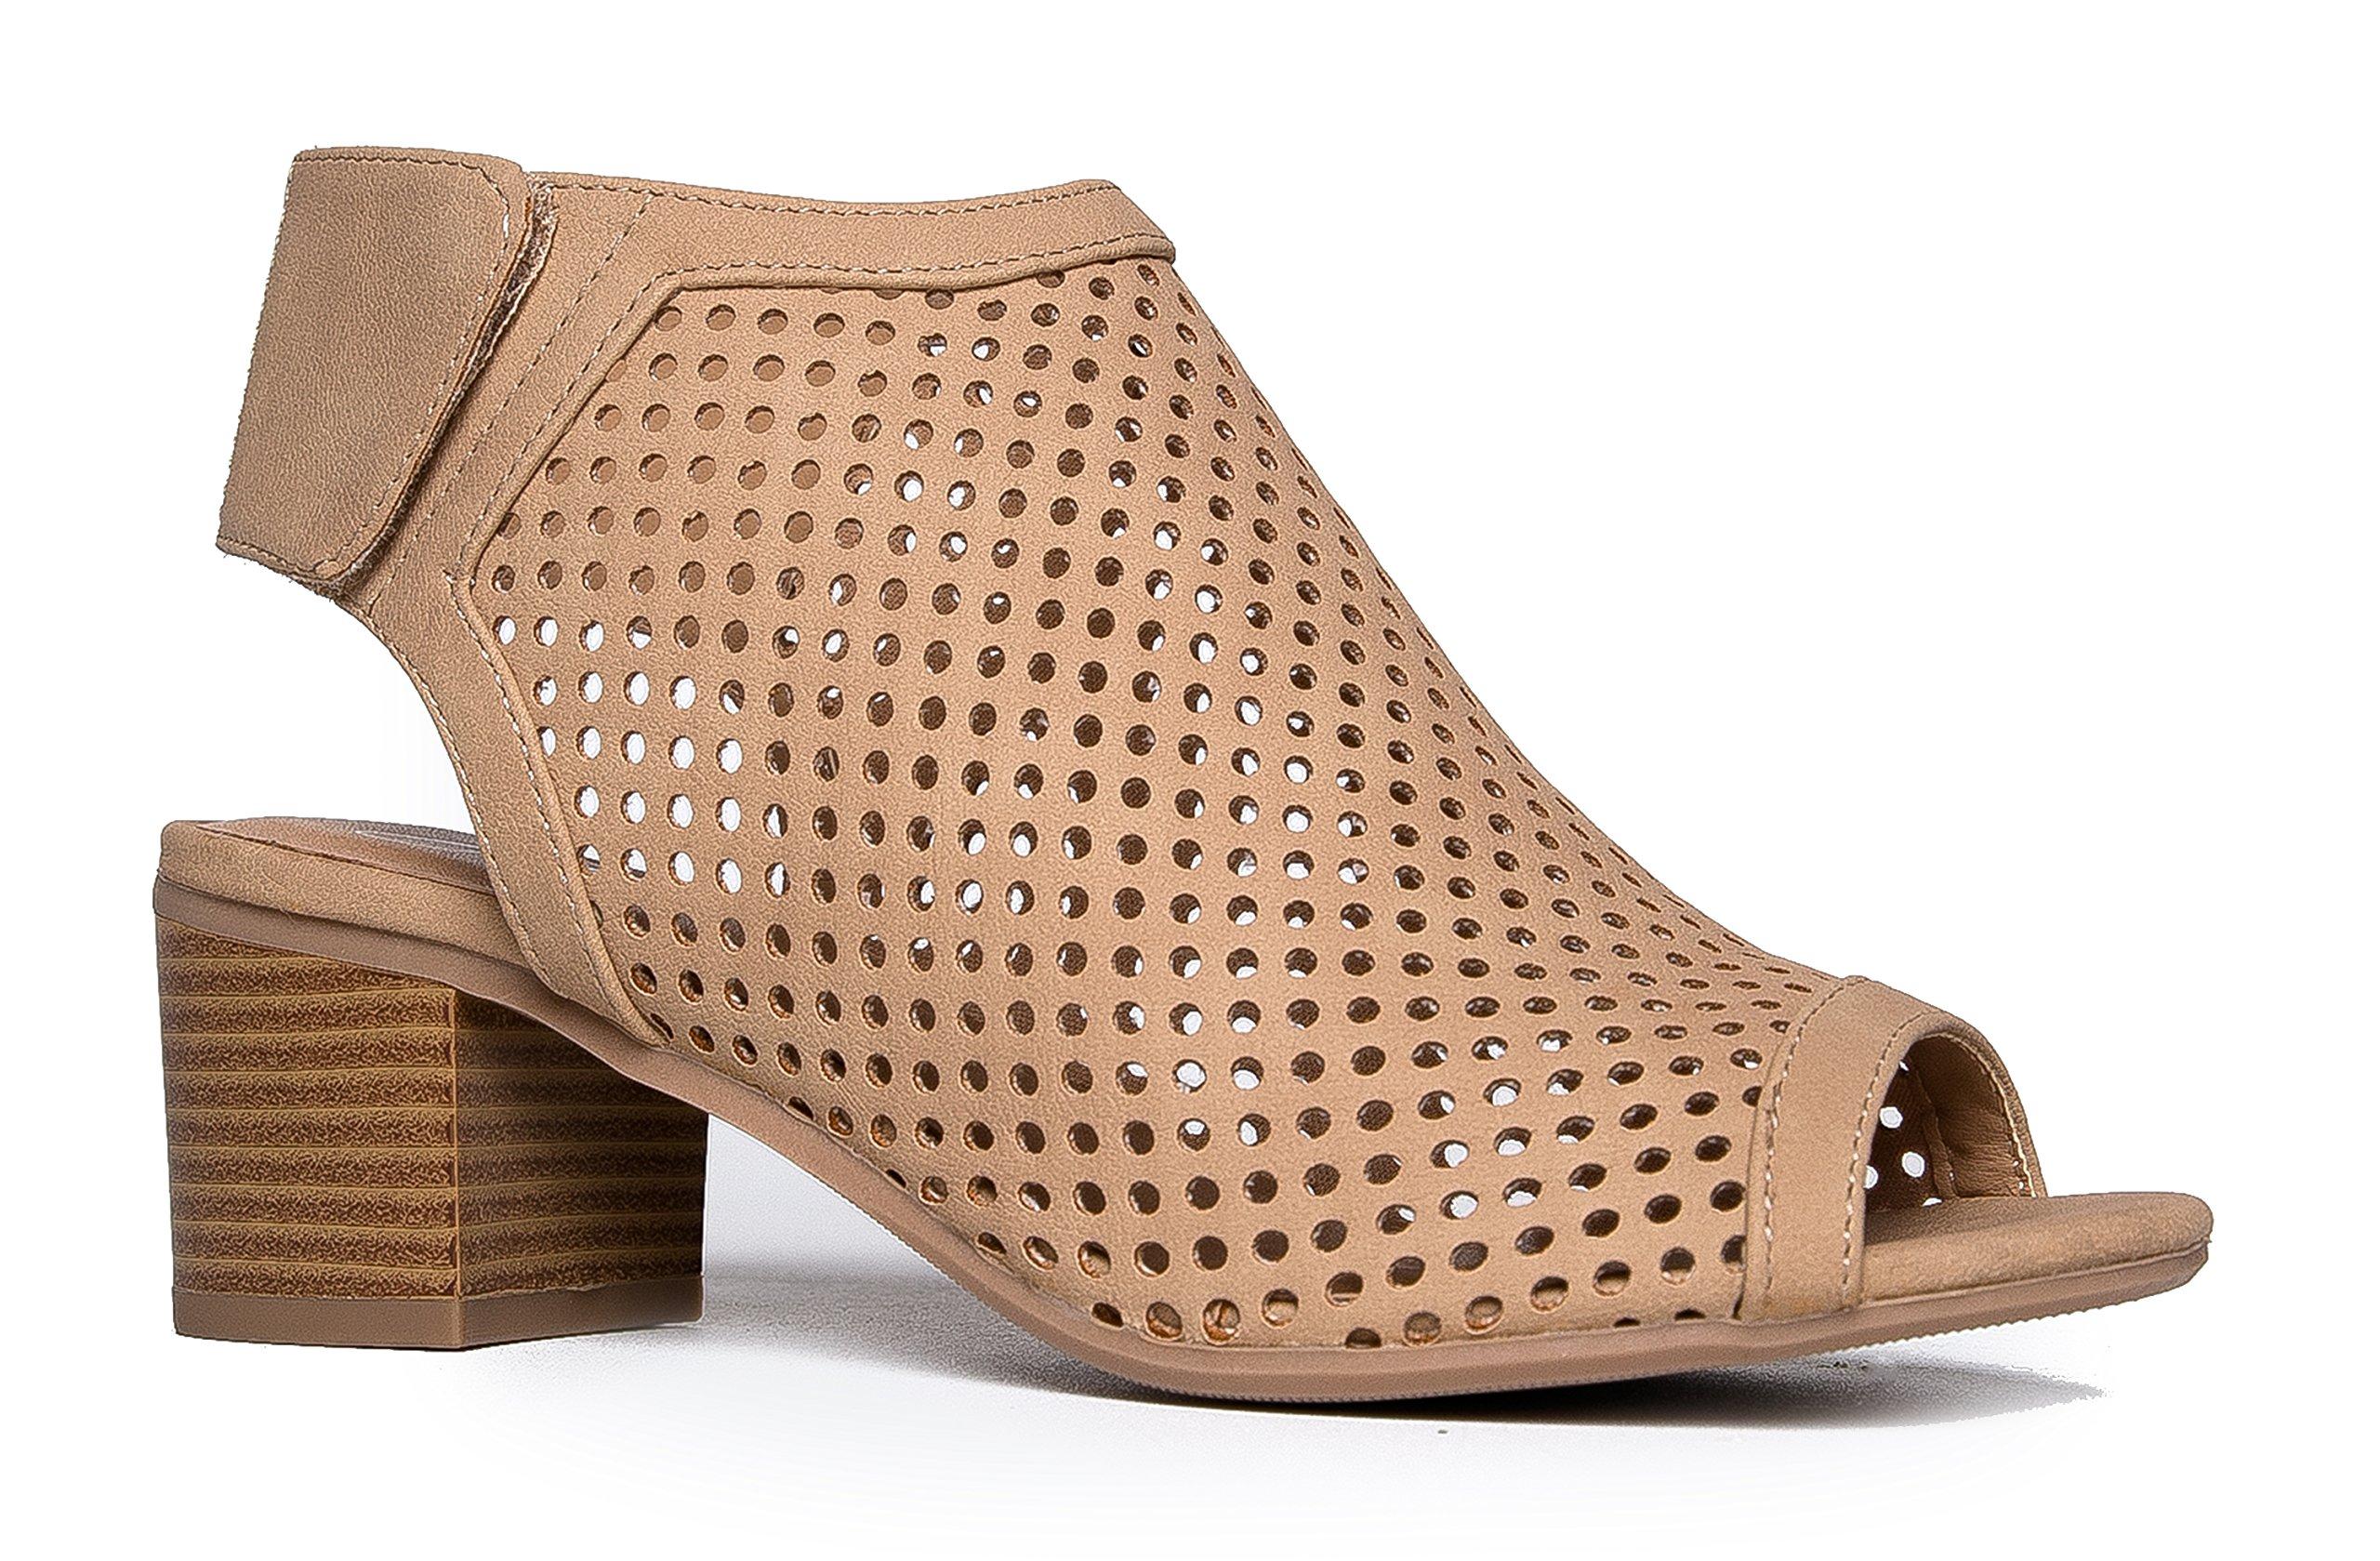 J. Adams Cut Out Velcro Strap Bootie - Slip On Low Stacked Heel - Open Peep Toe Cutout Shoe Maddie